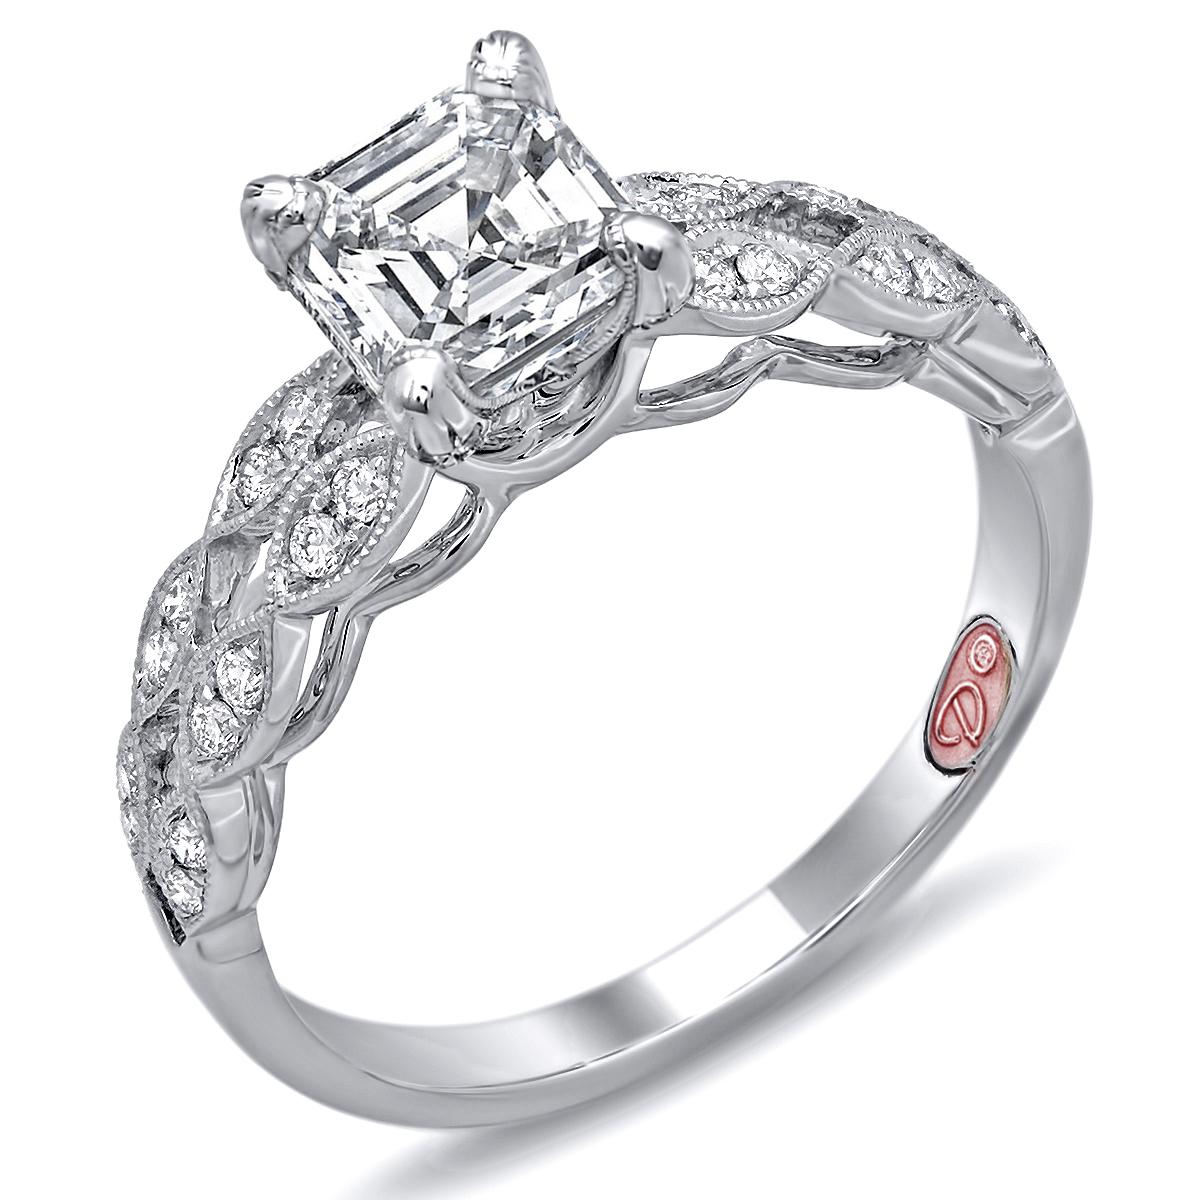 Designer Engagement Rings - DW6110